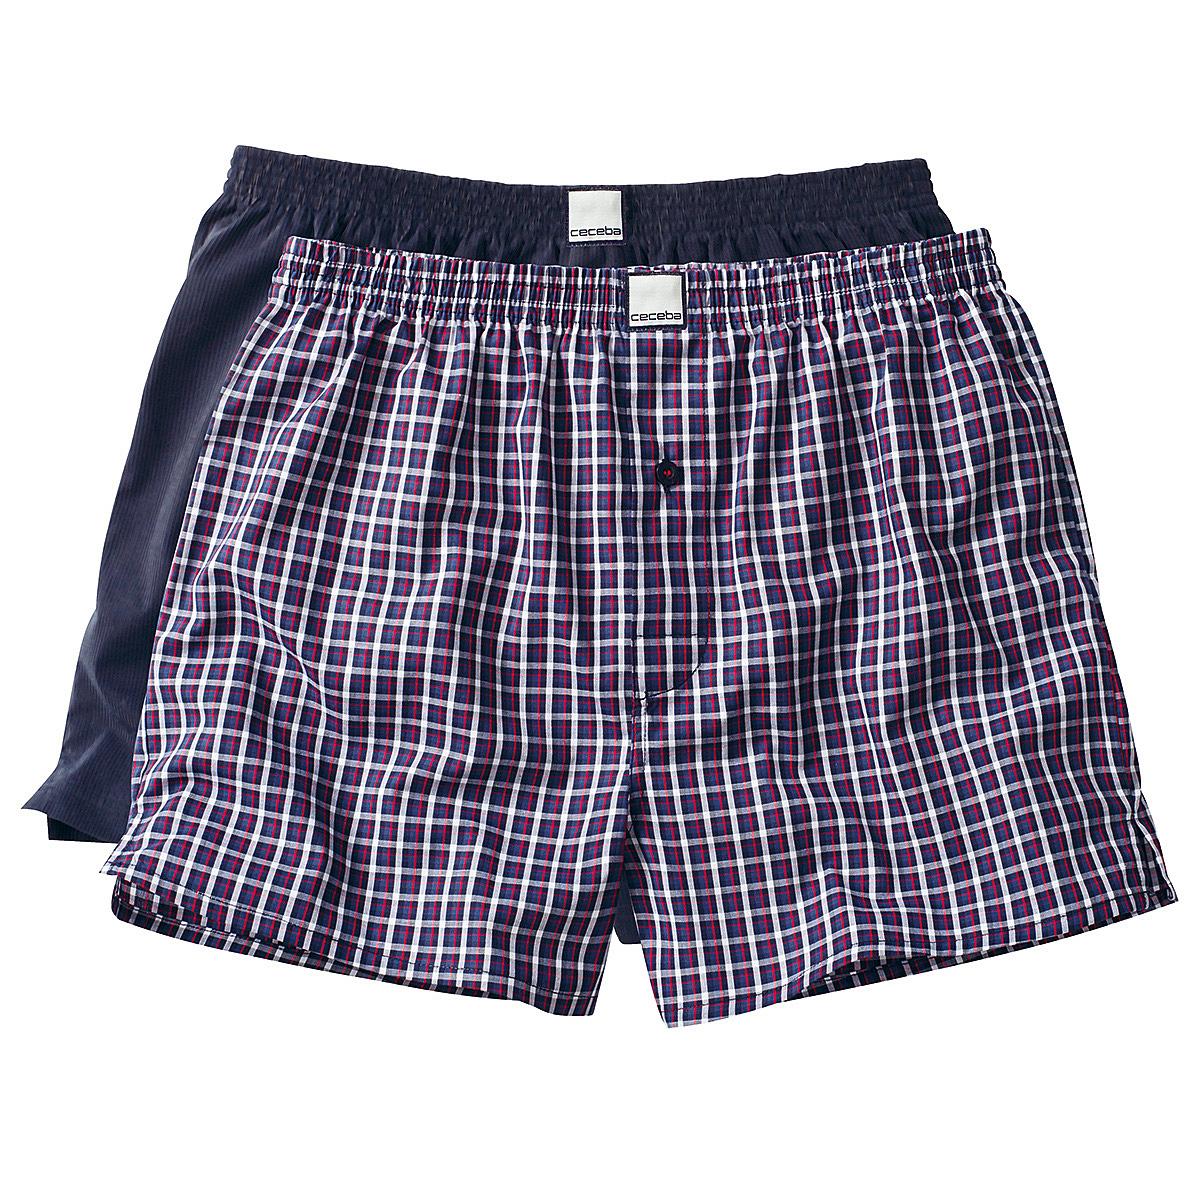 ecd6e6770715d Ceceba | Web-Shorts 2er Pack | Boxer Shorts Baumwolle | Blau Karo